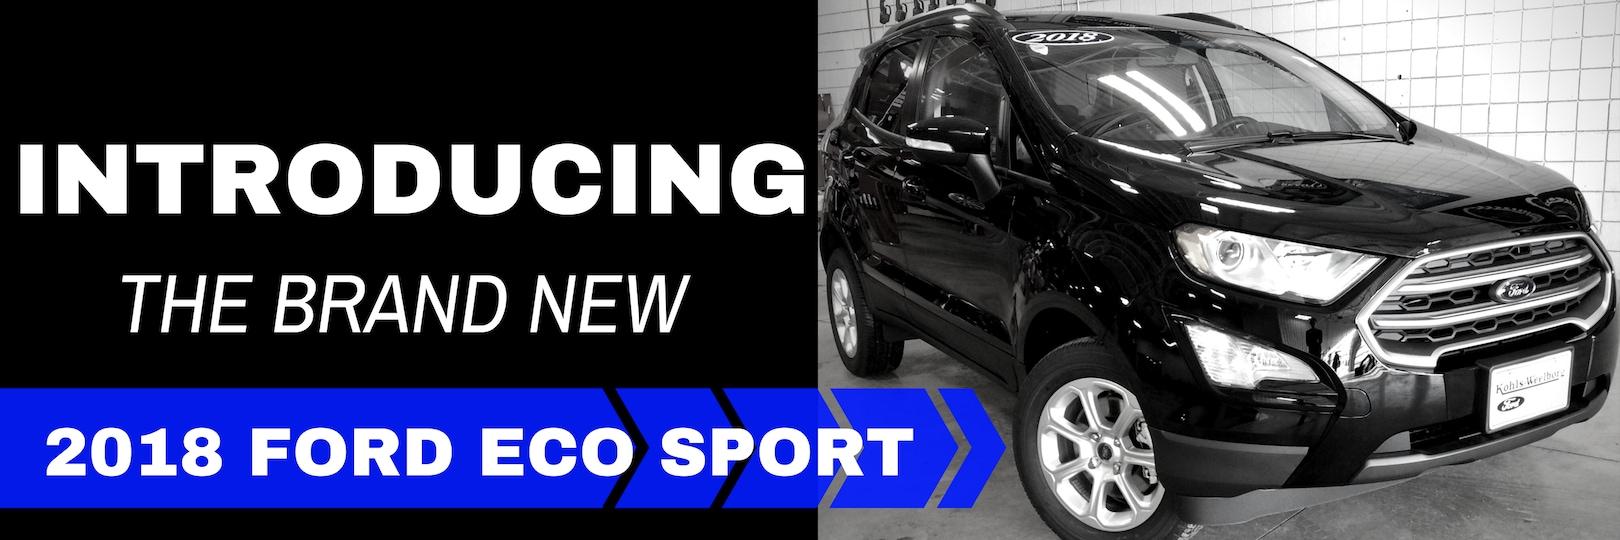 Kohls Weelborg Ford Inc Ford Dealership In Redwood Falls MN - Ford dealerships mn